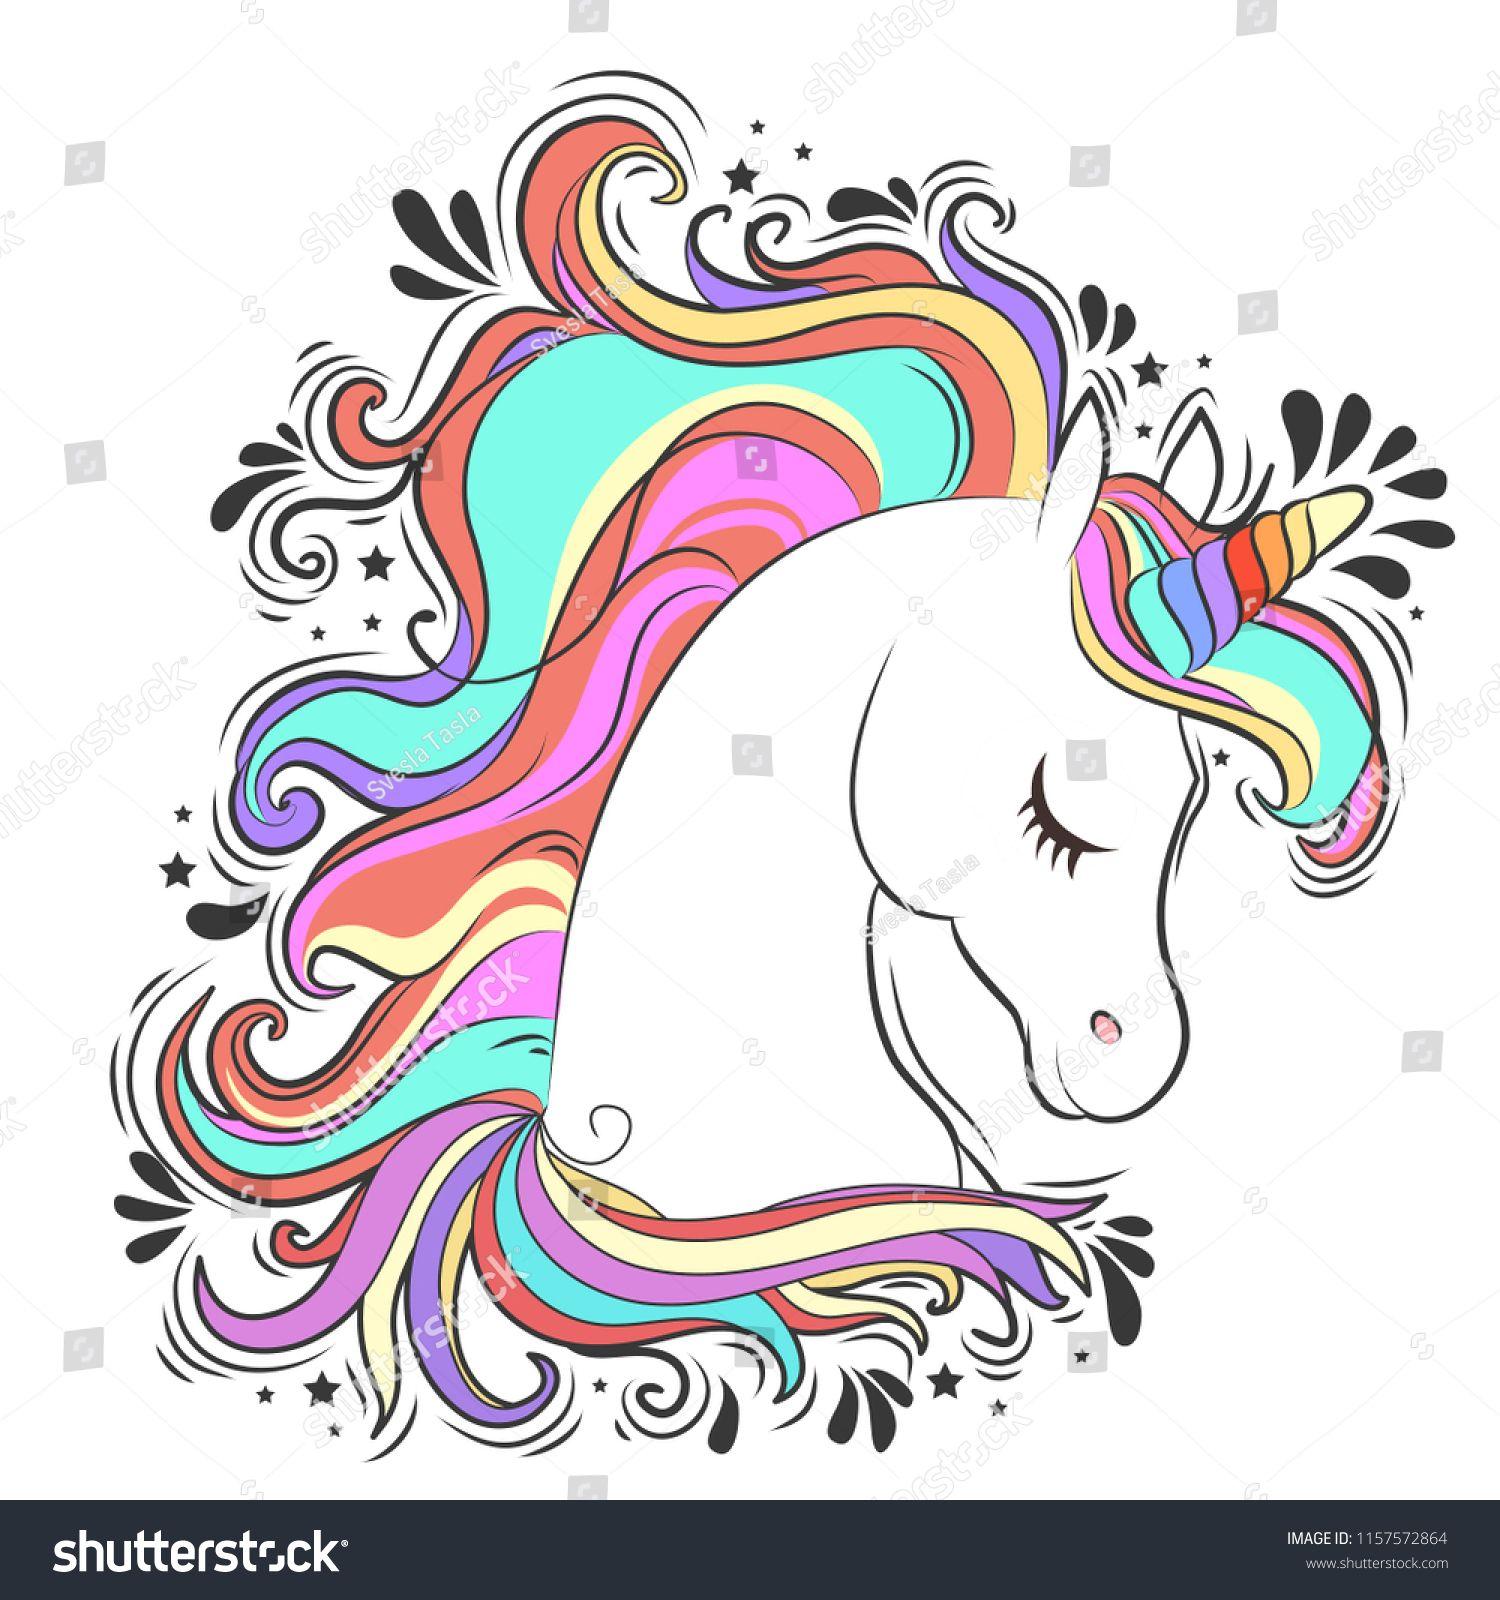 Cute White Unicorn With Rainbow Hair Vector Illustration For